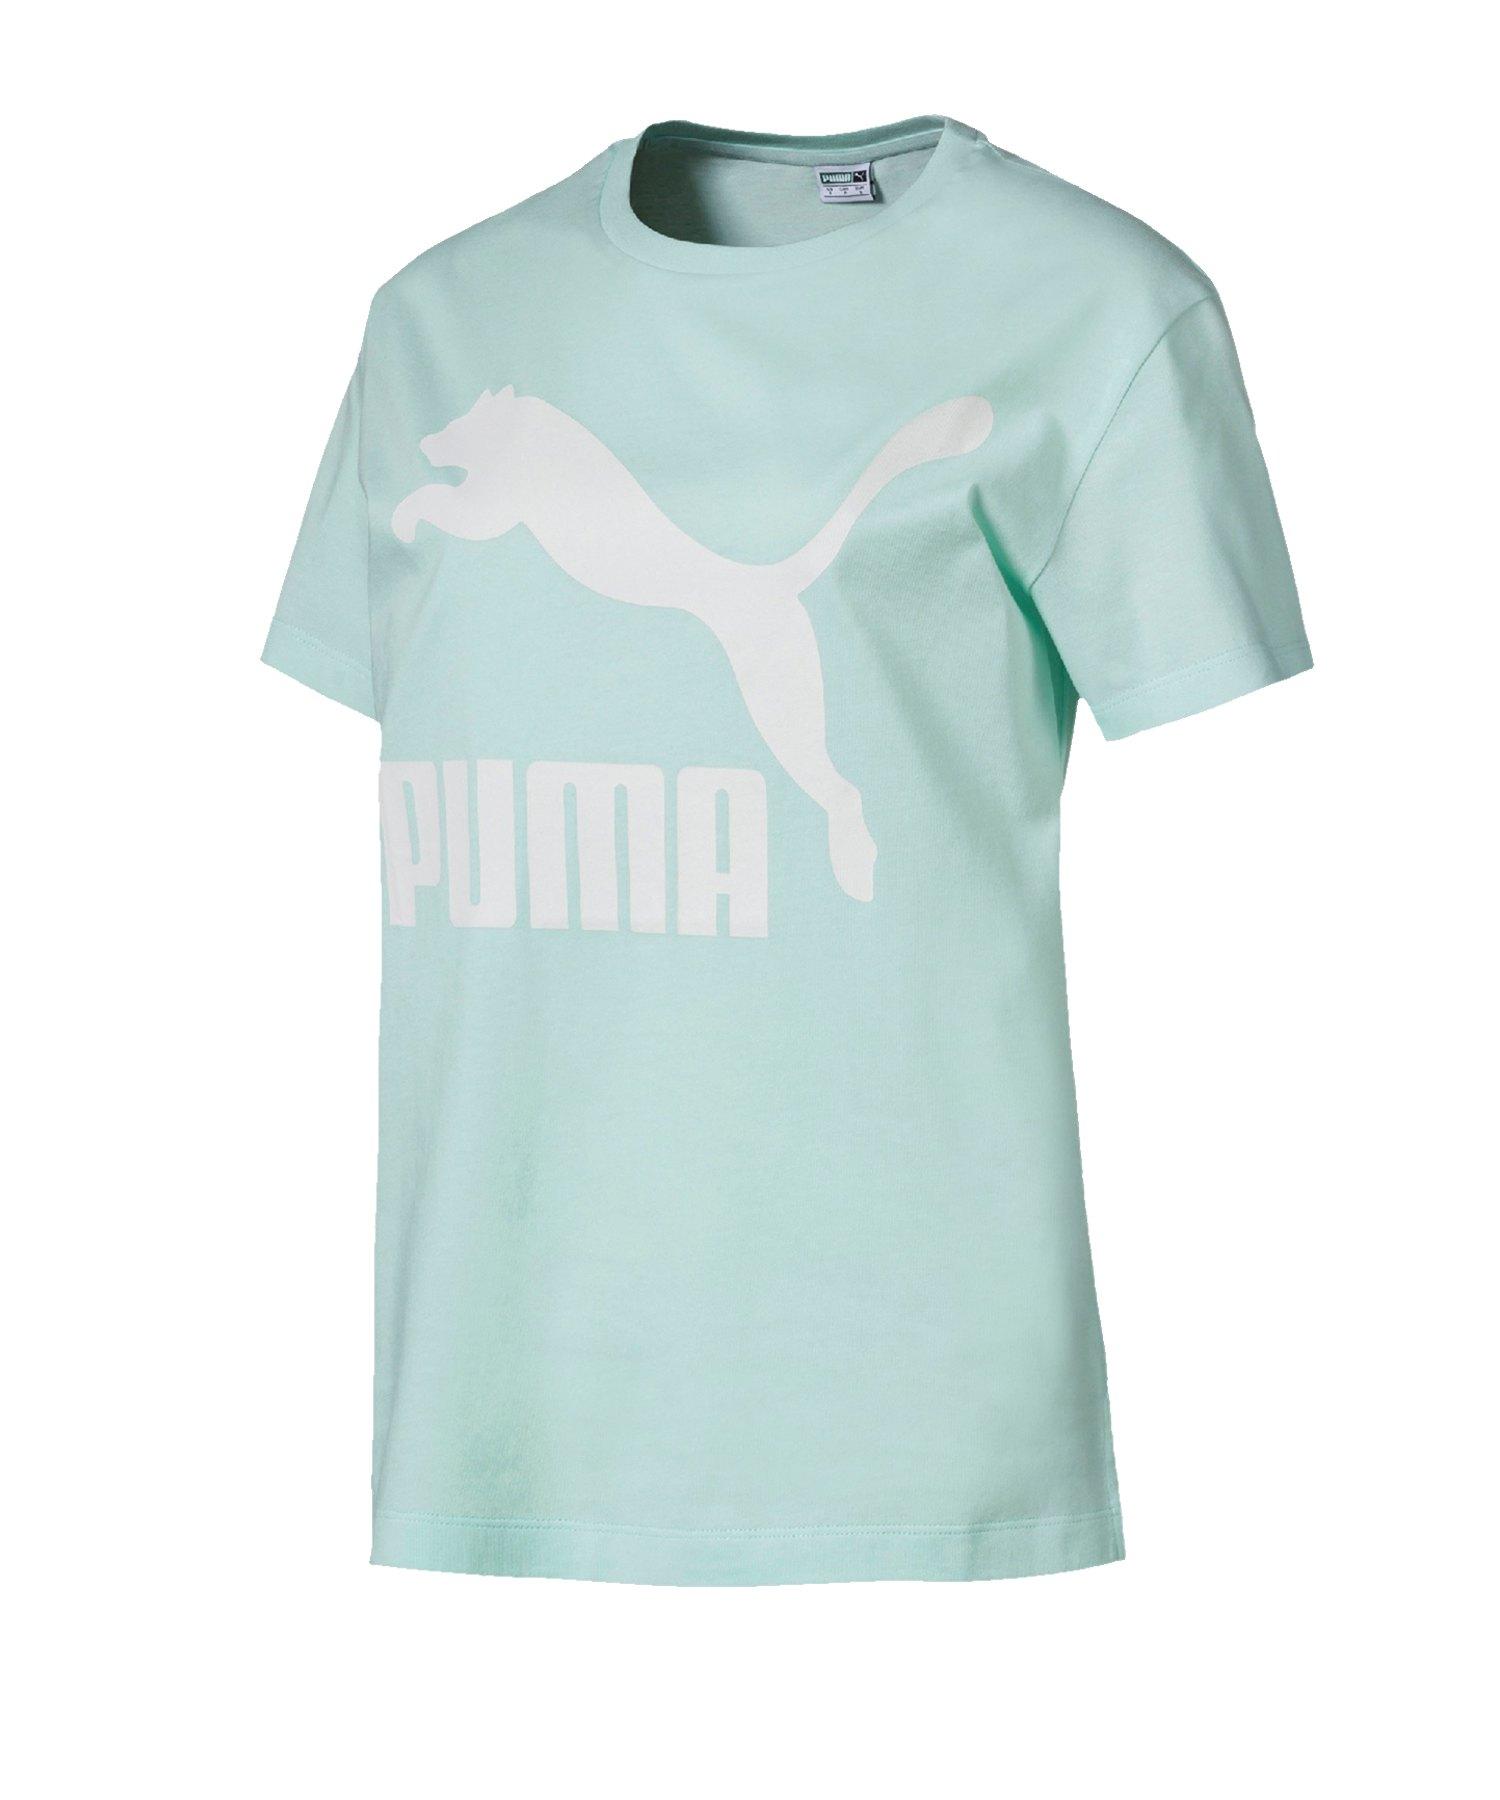 PUMA Classics Logo Tee T-Shirt Damen Blau F34 - blau